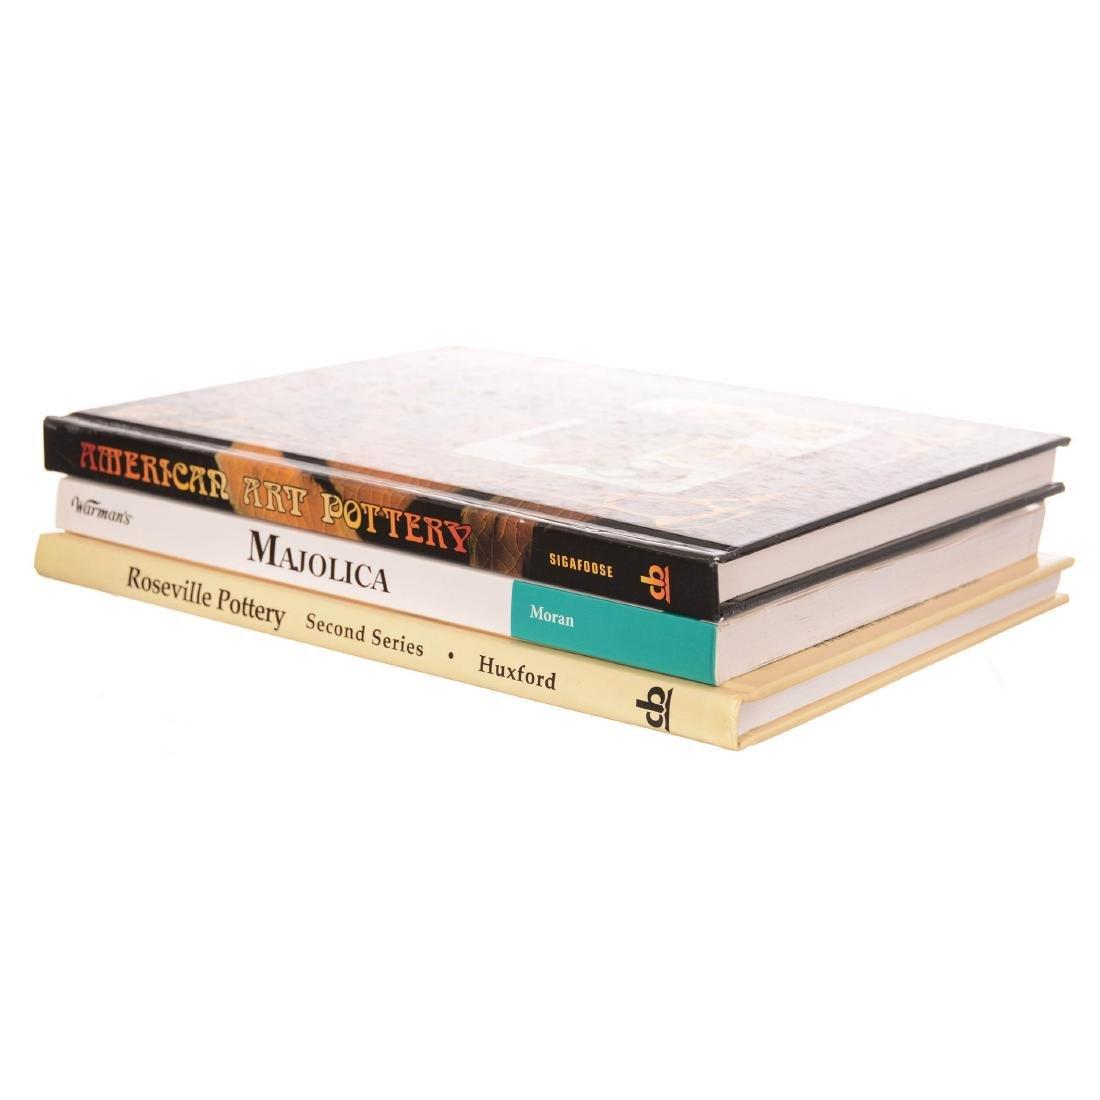 (3) Books - 2